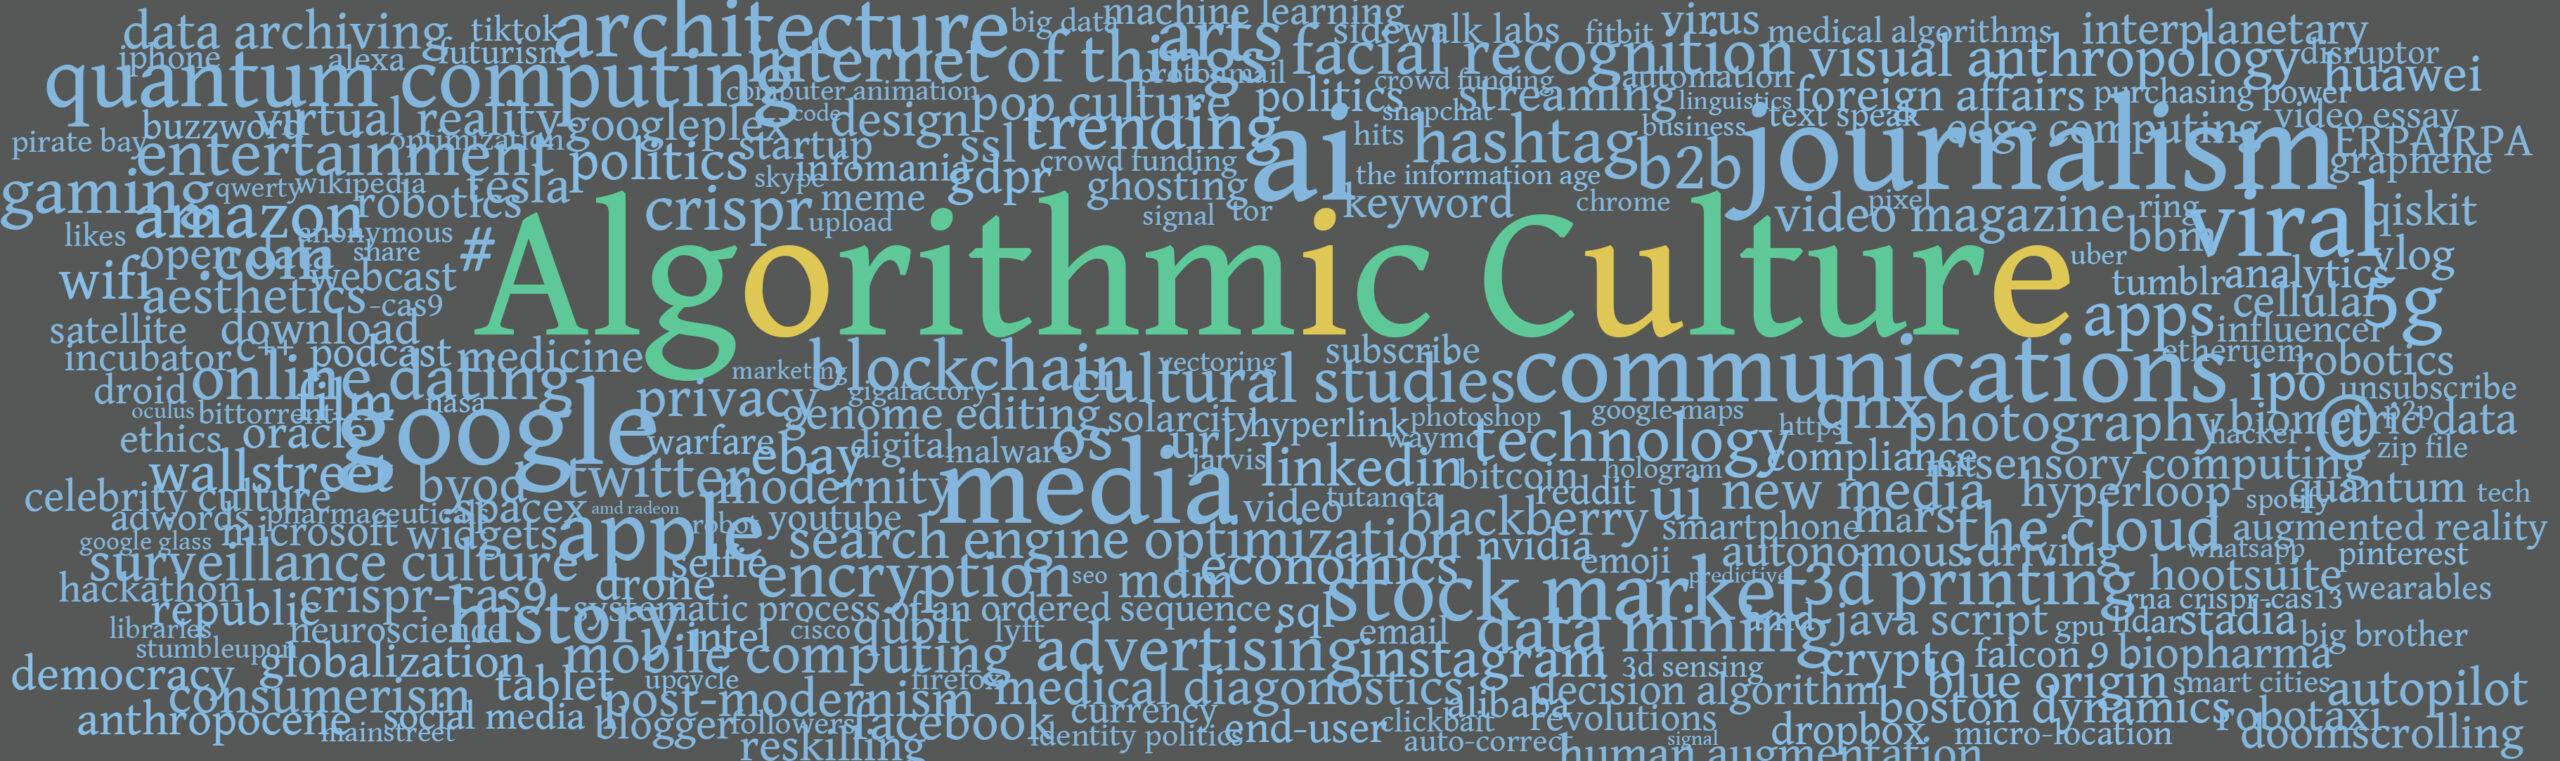 Algorithmic Culture Magazine